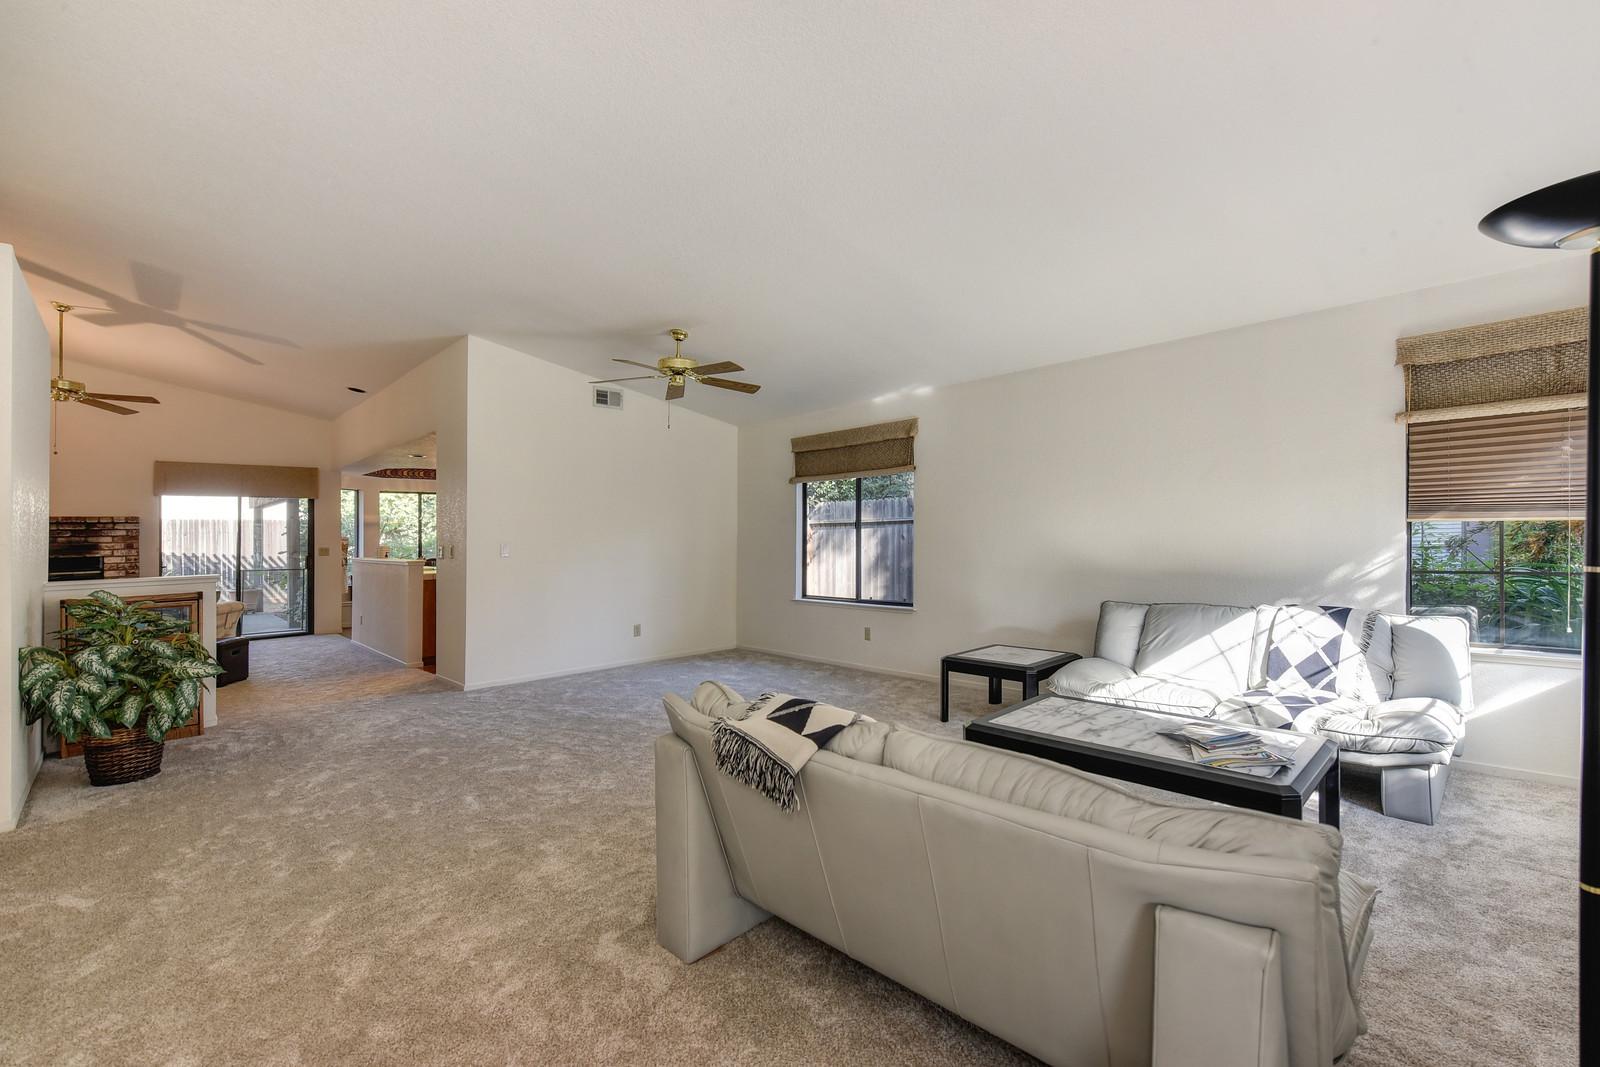 9158 Old Creek Dr Living Room | Realtor in Elk Grove California